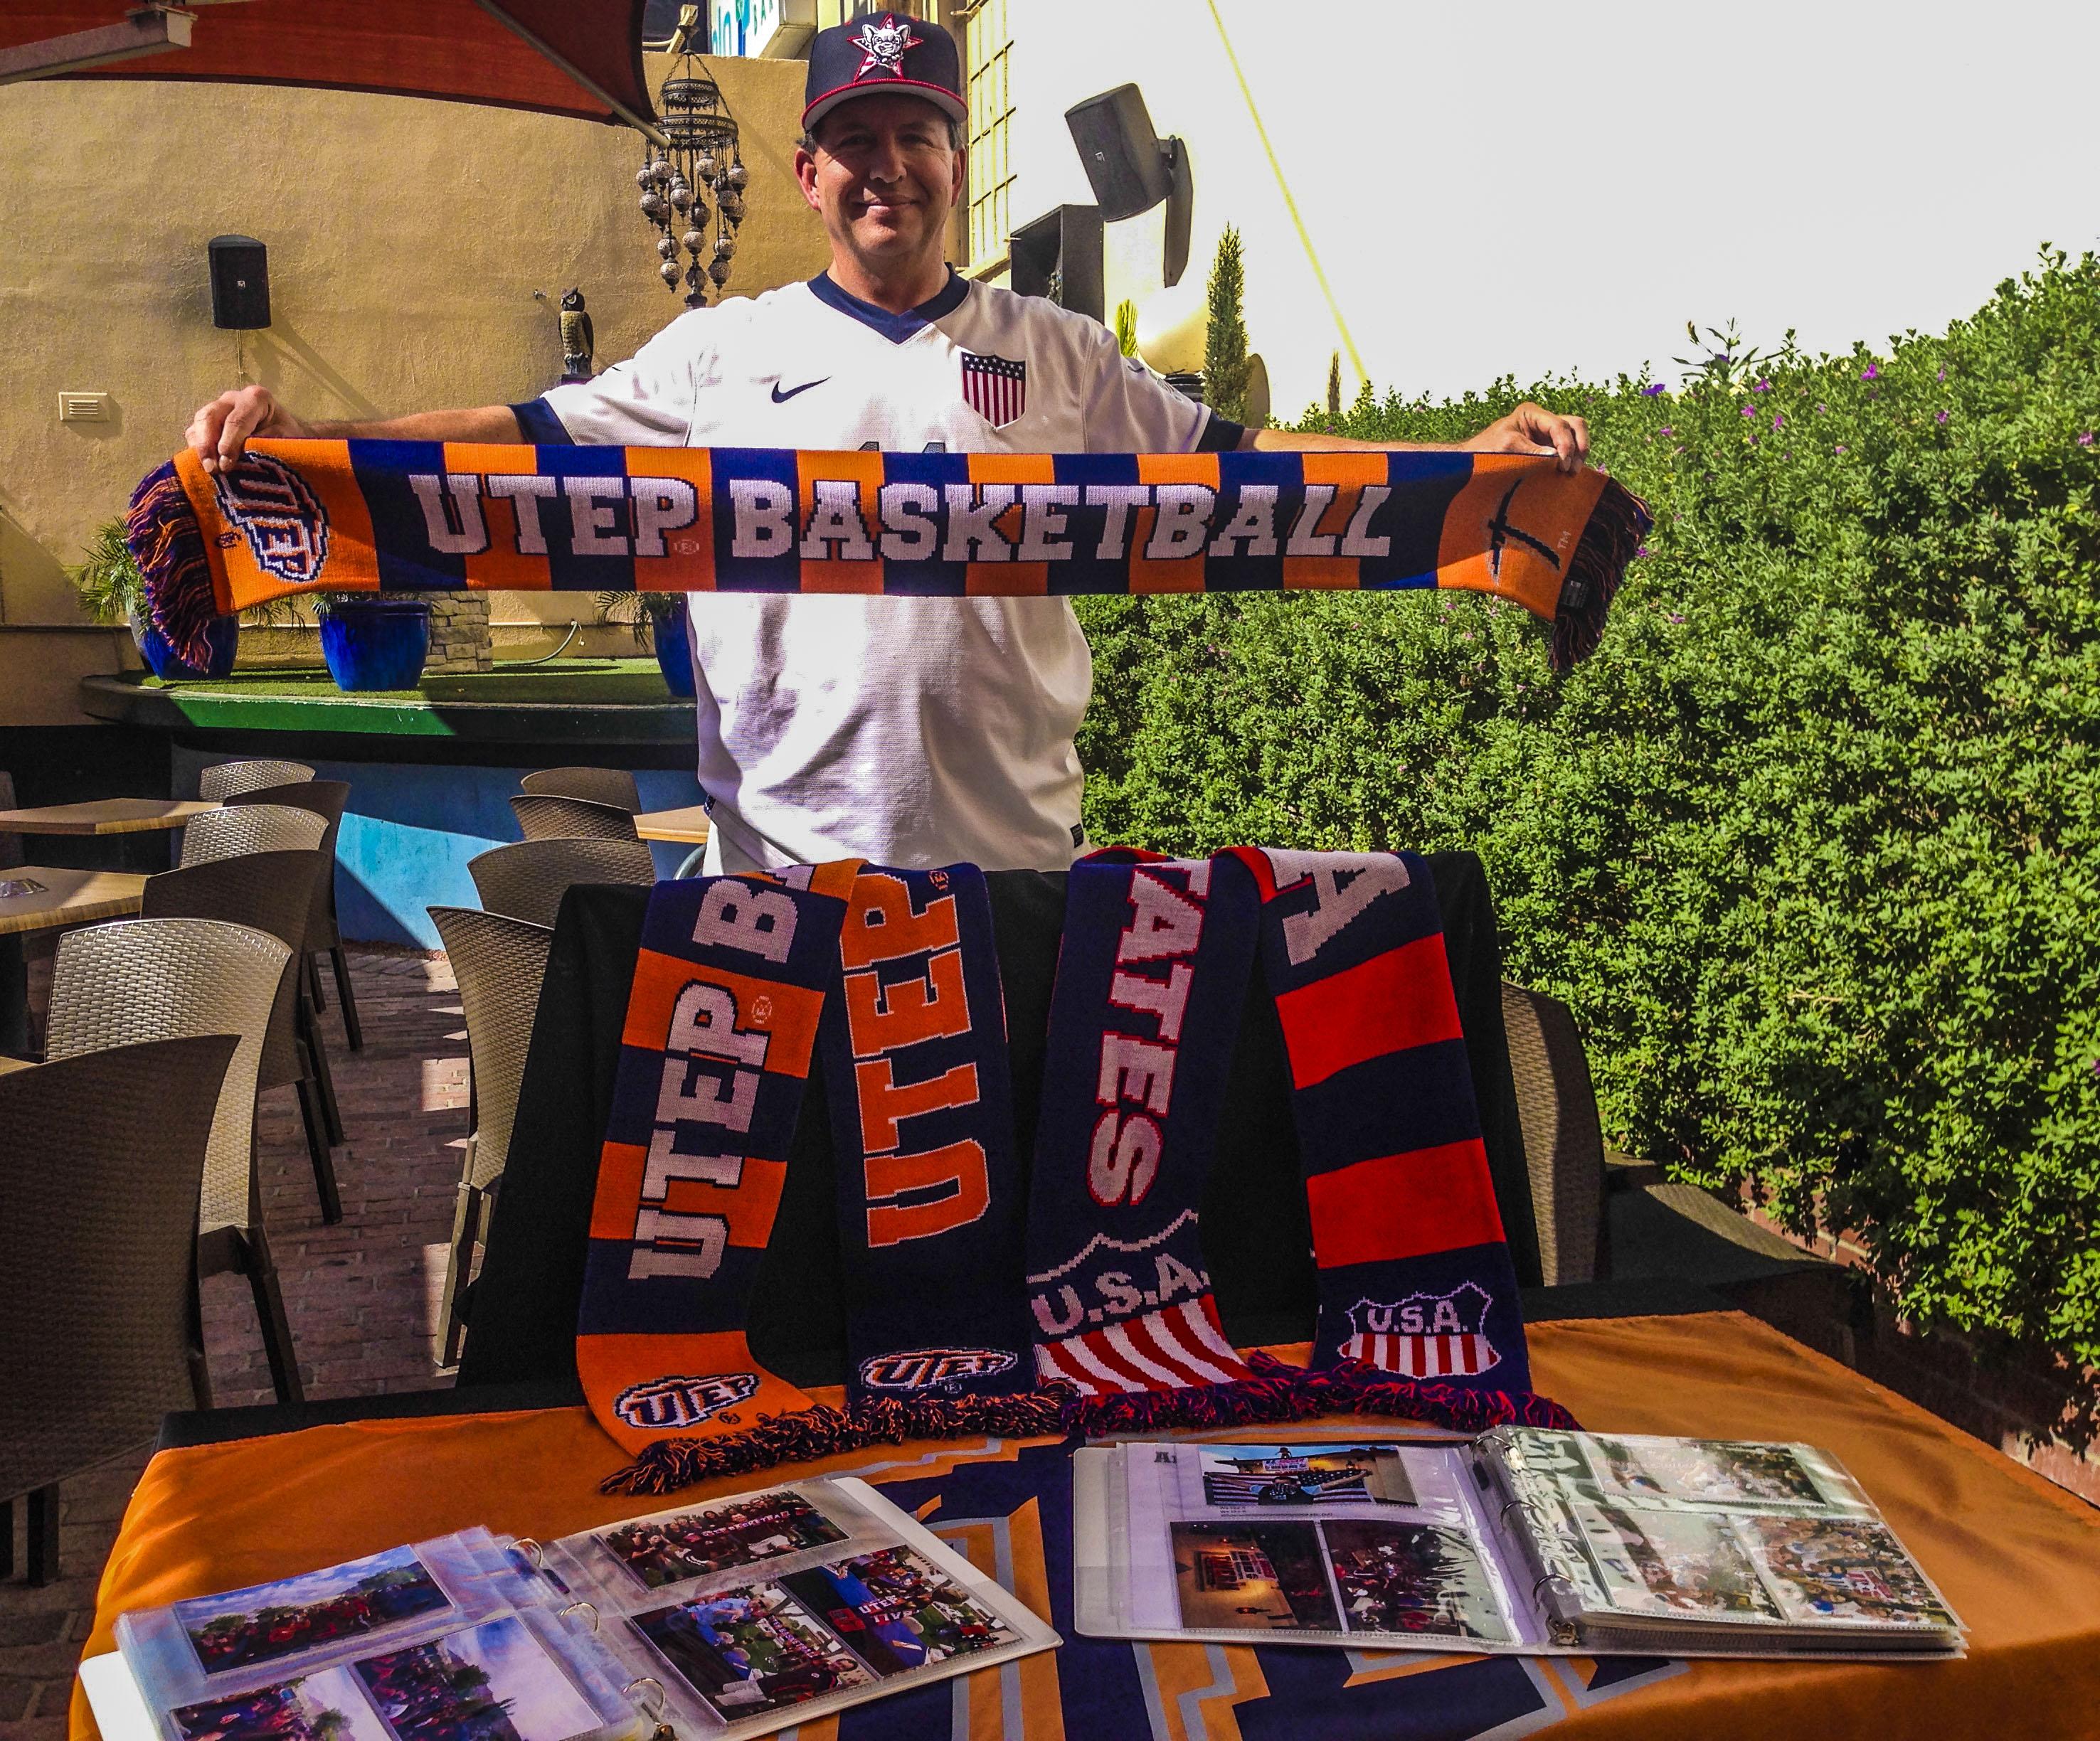 UT El Paso Super Fan Gregg Bush , who says he bleeds orange and navy, shows off his fan gear. Photo by Hector Bernal, Borderzine.com